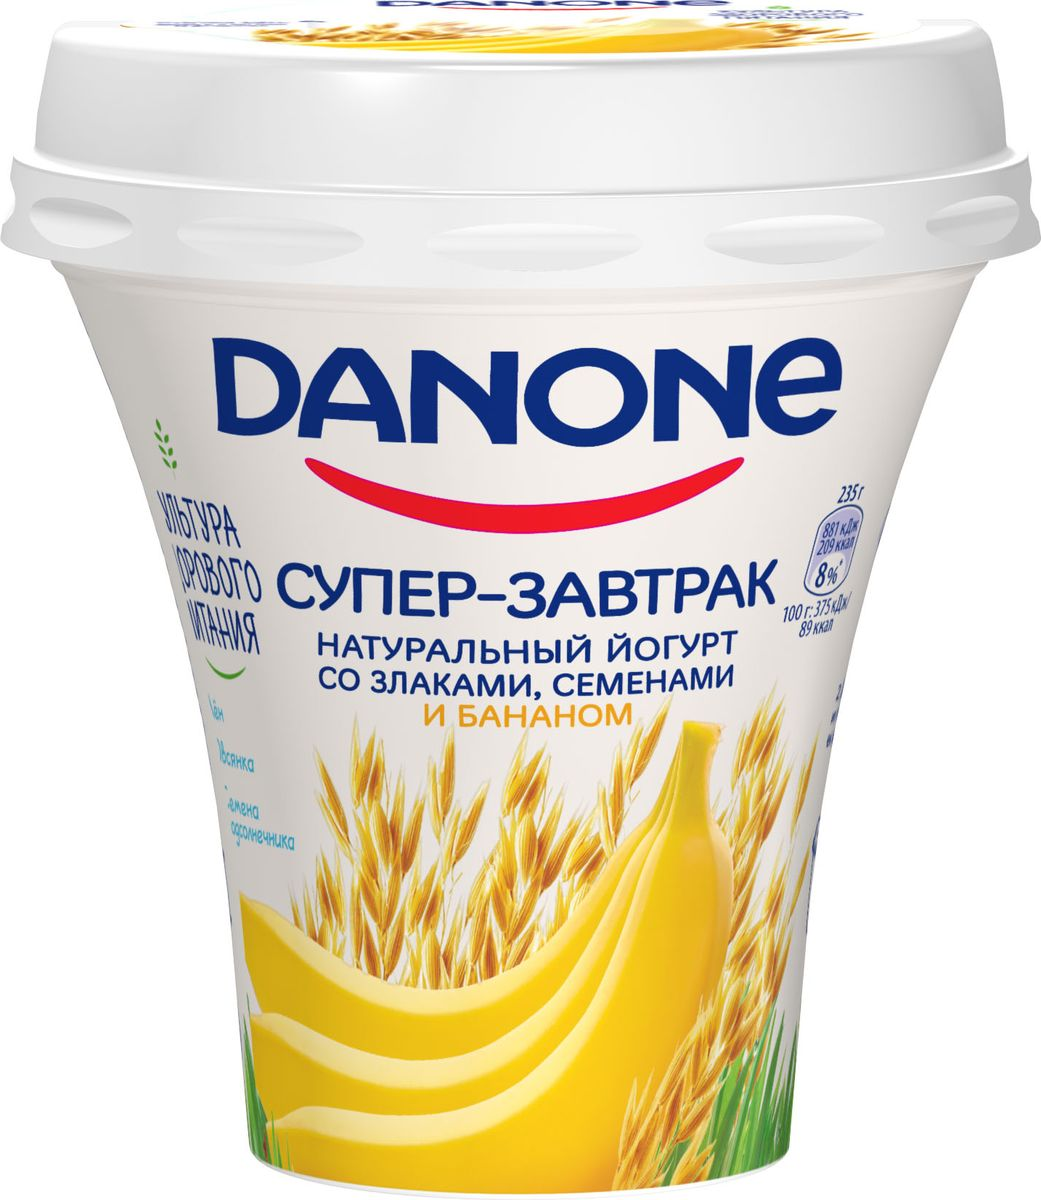 Danone Супер-завтрак Йогурт питьевой Злаки, Семена И Банан 2,6%, 235 г danone йогурт питьевой 2 5